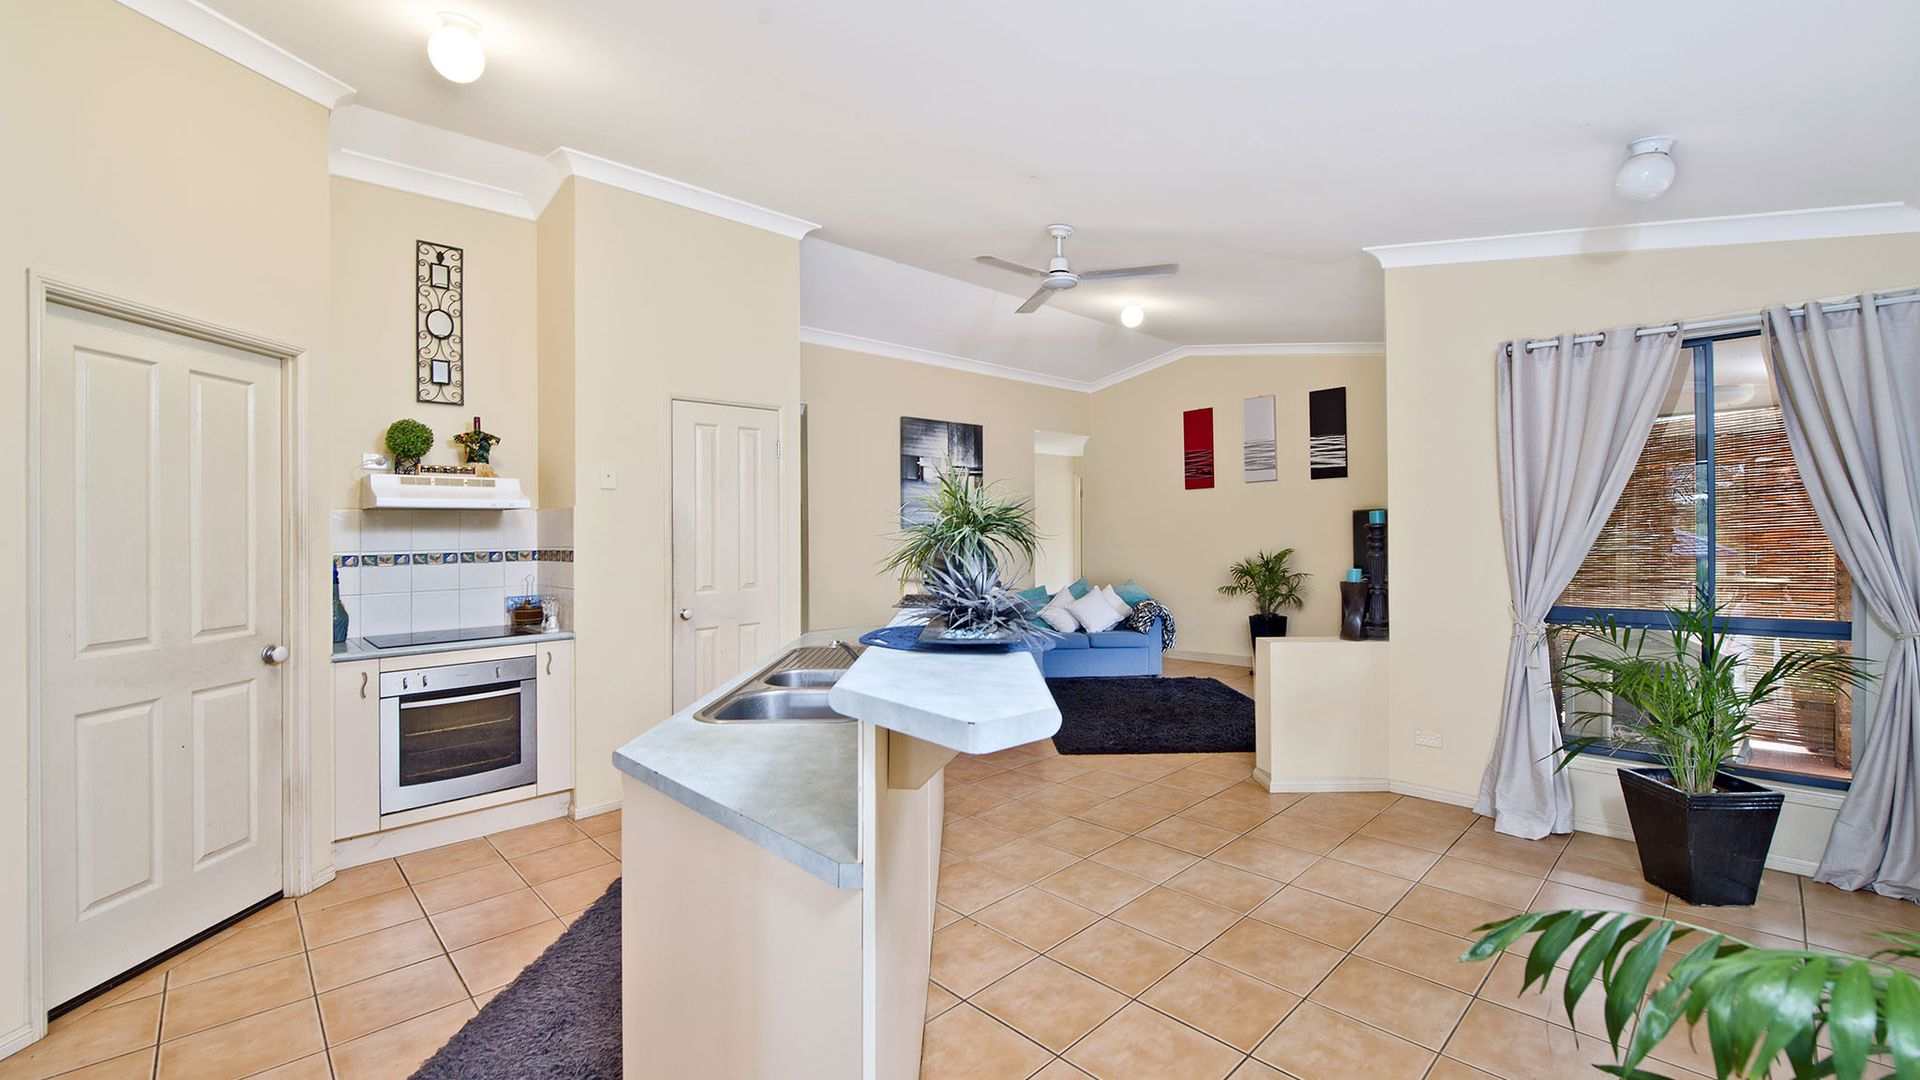 53 Brindabella Way, Port Macquarie NSW 2444, Image 2